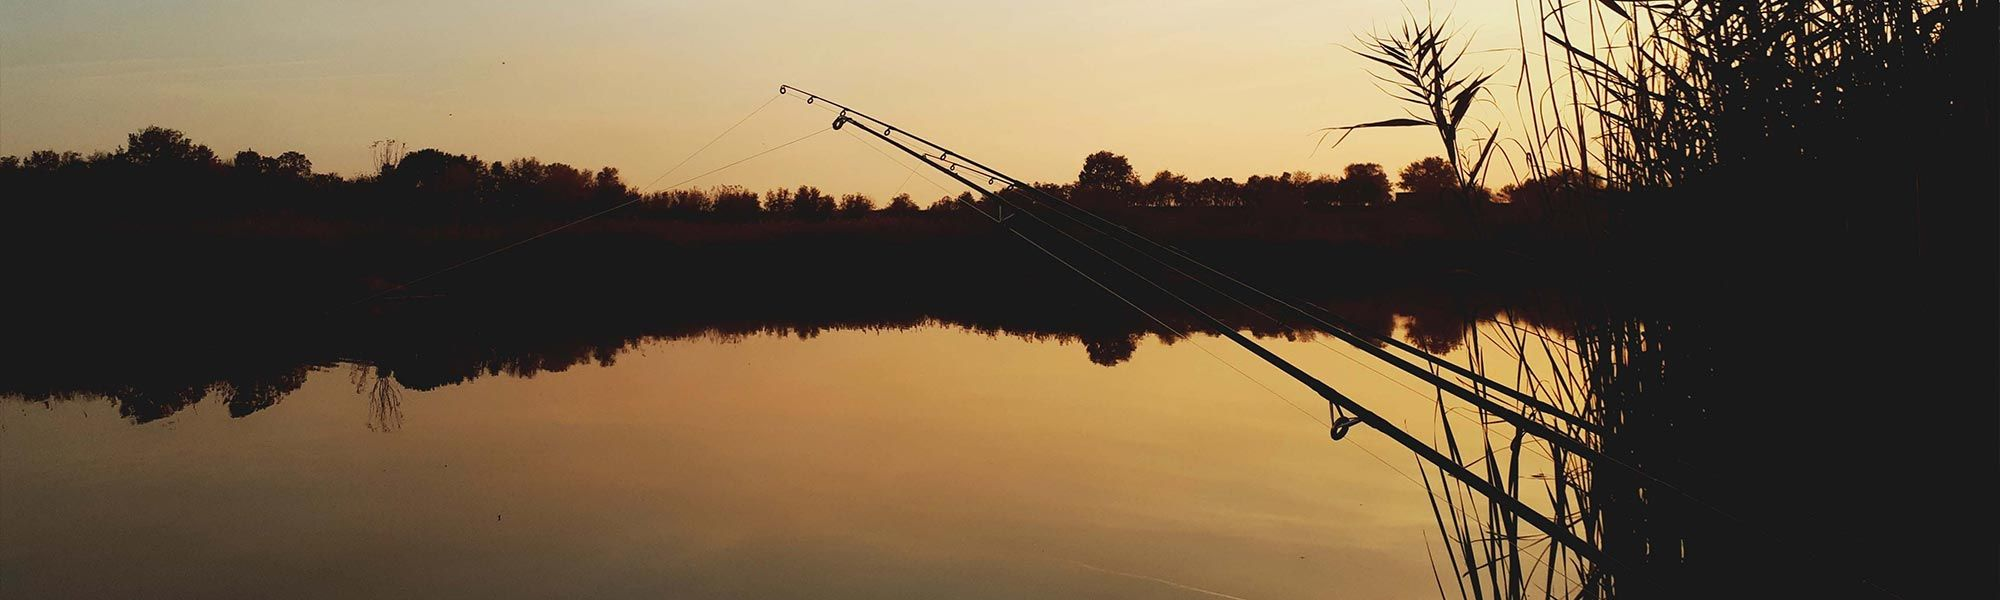 Hainaut-Pêche